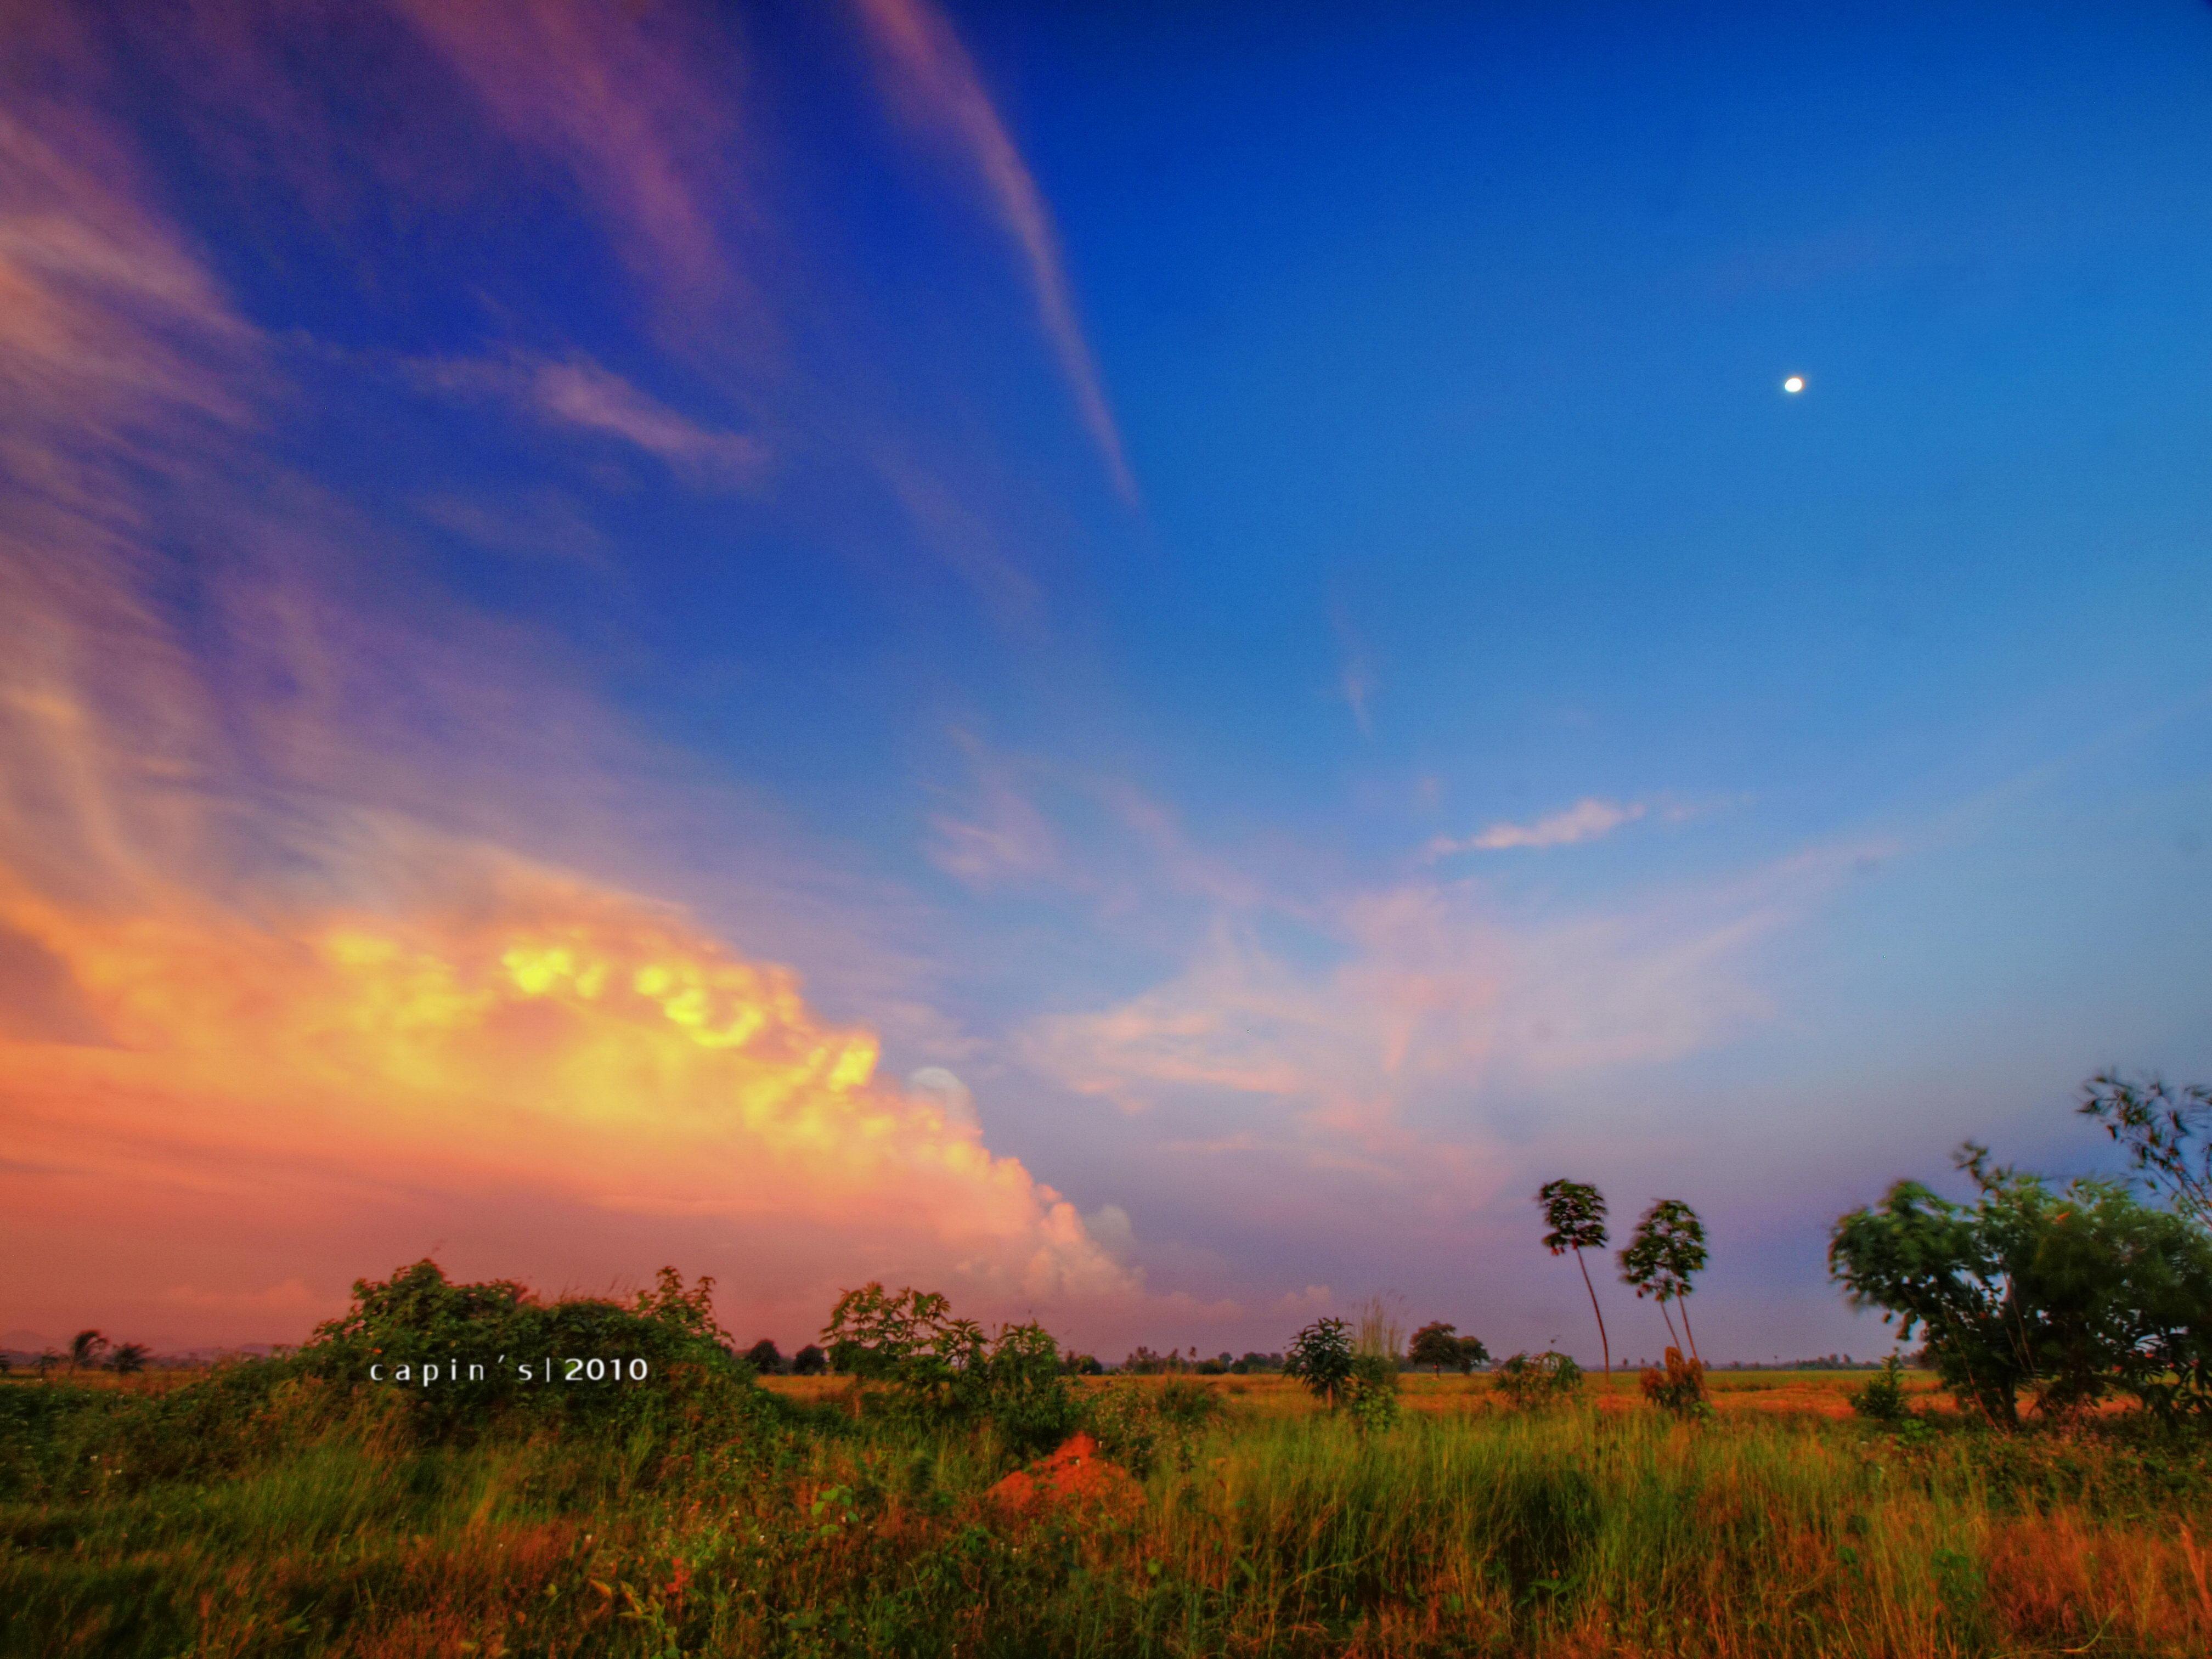 Sunset Backyard Scenery Fantasy Finalfantasy HDR Senja Capin Xenocapin 918mm